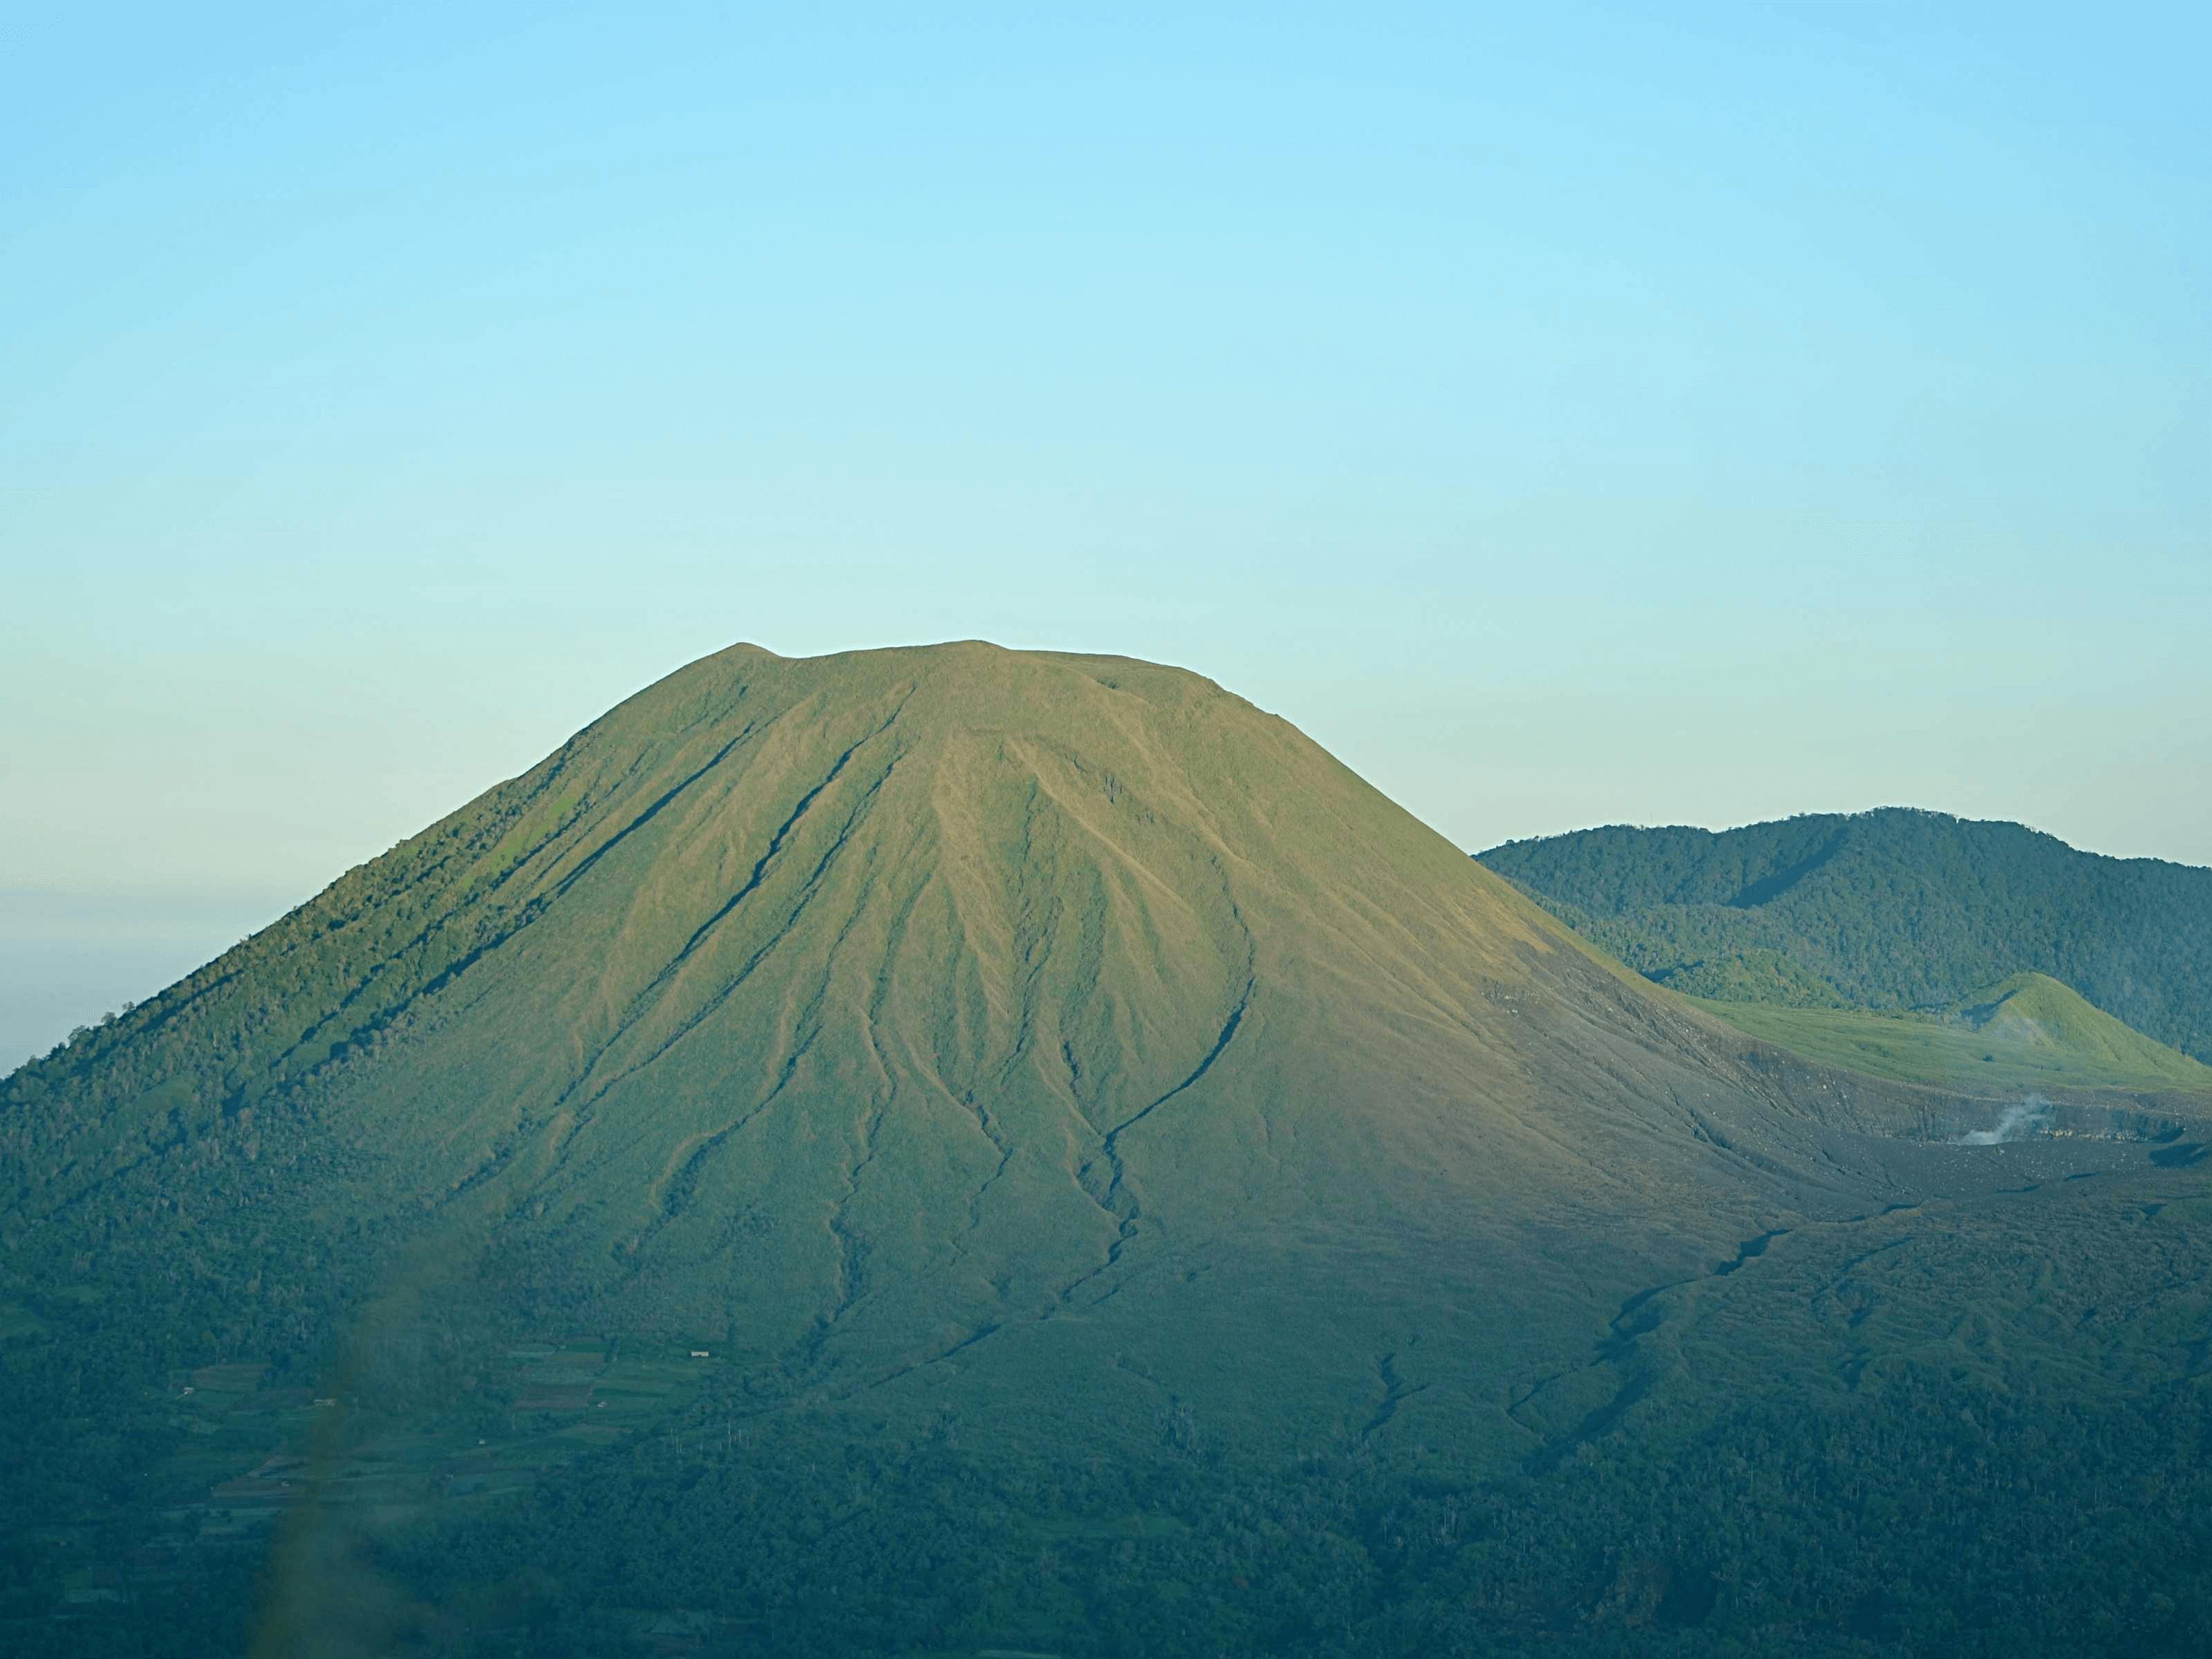 Volcan Lokon à Tomohon nord Sulawesi